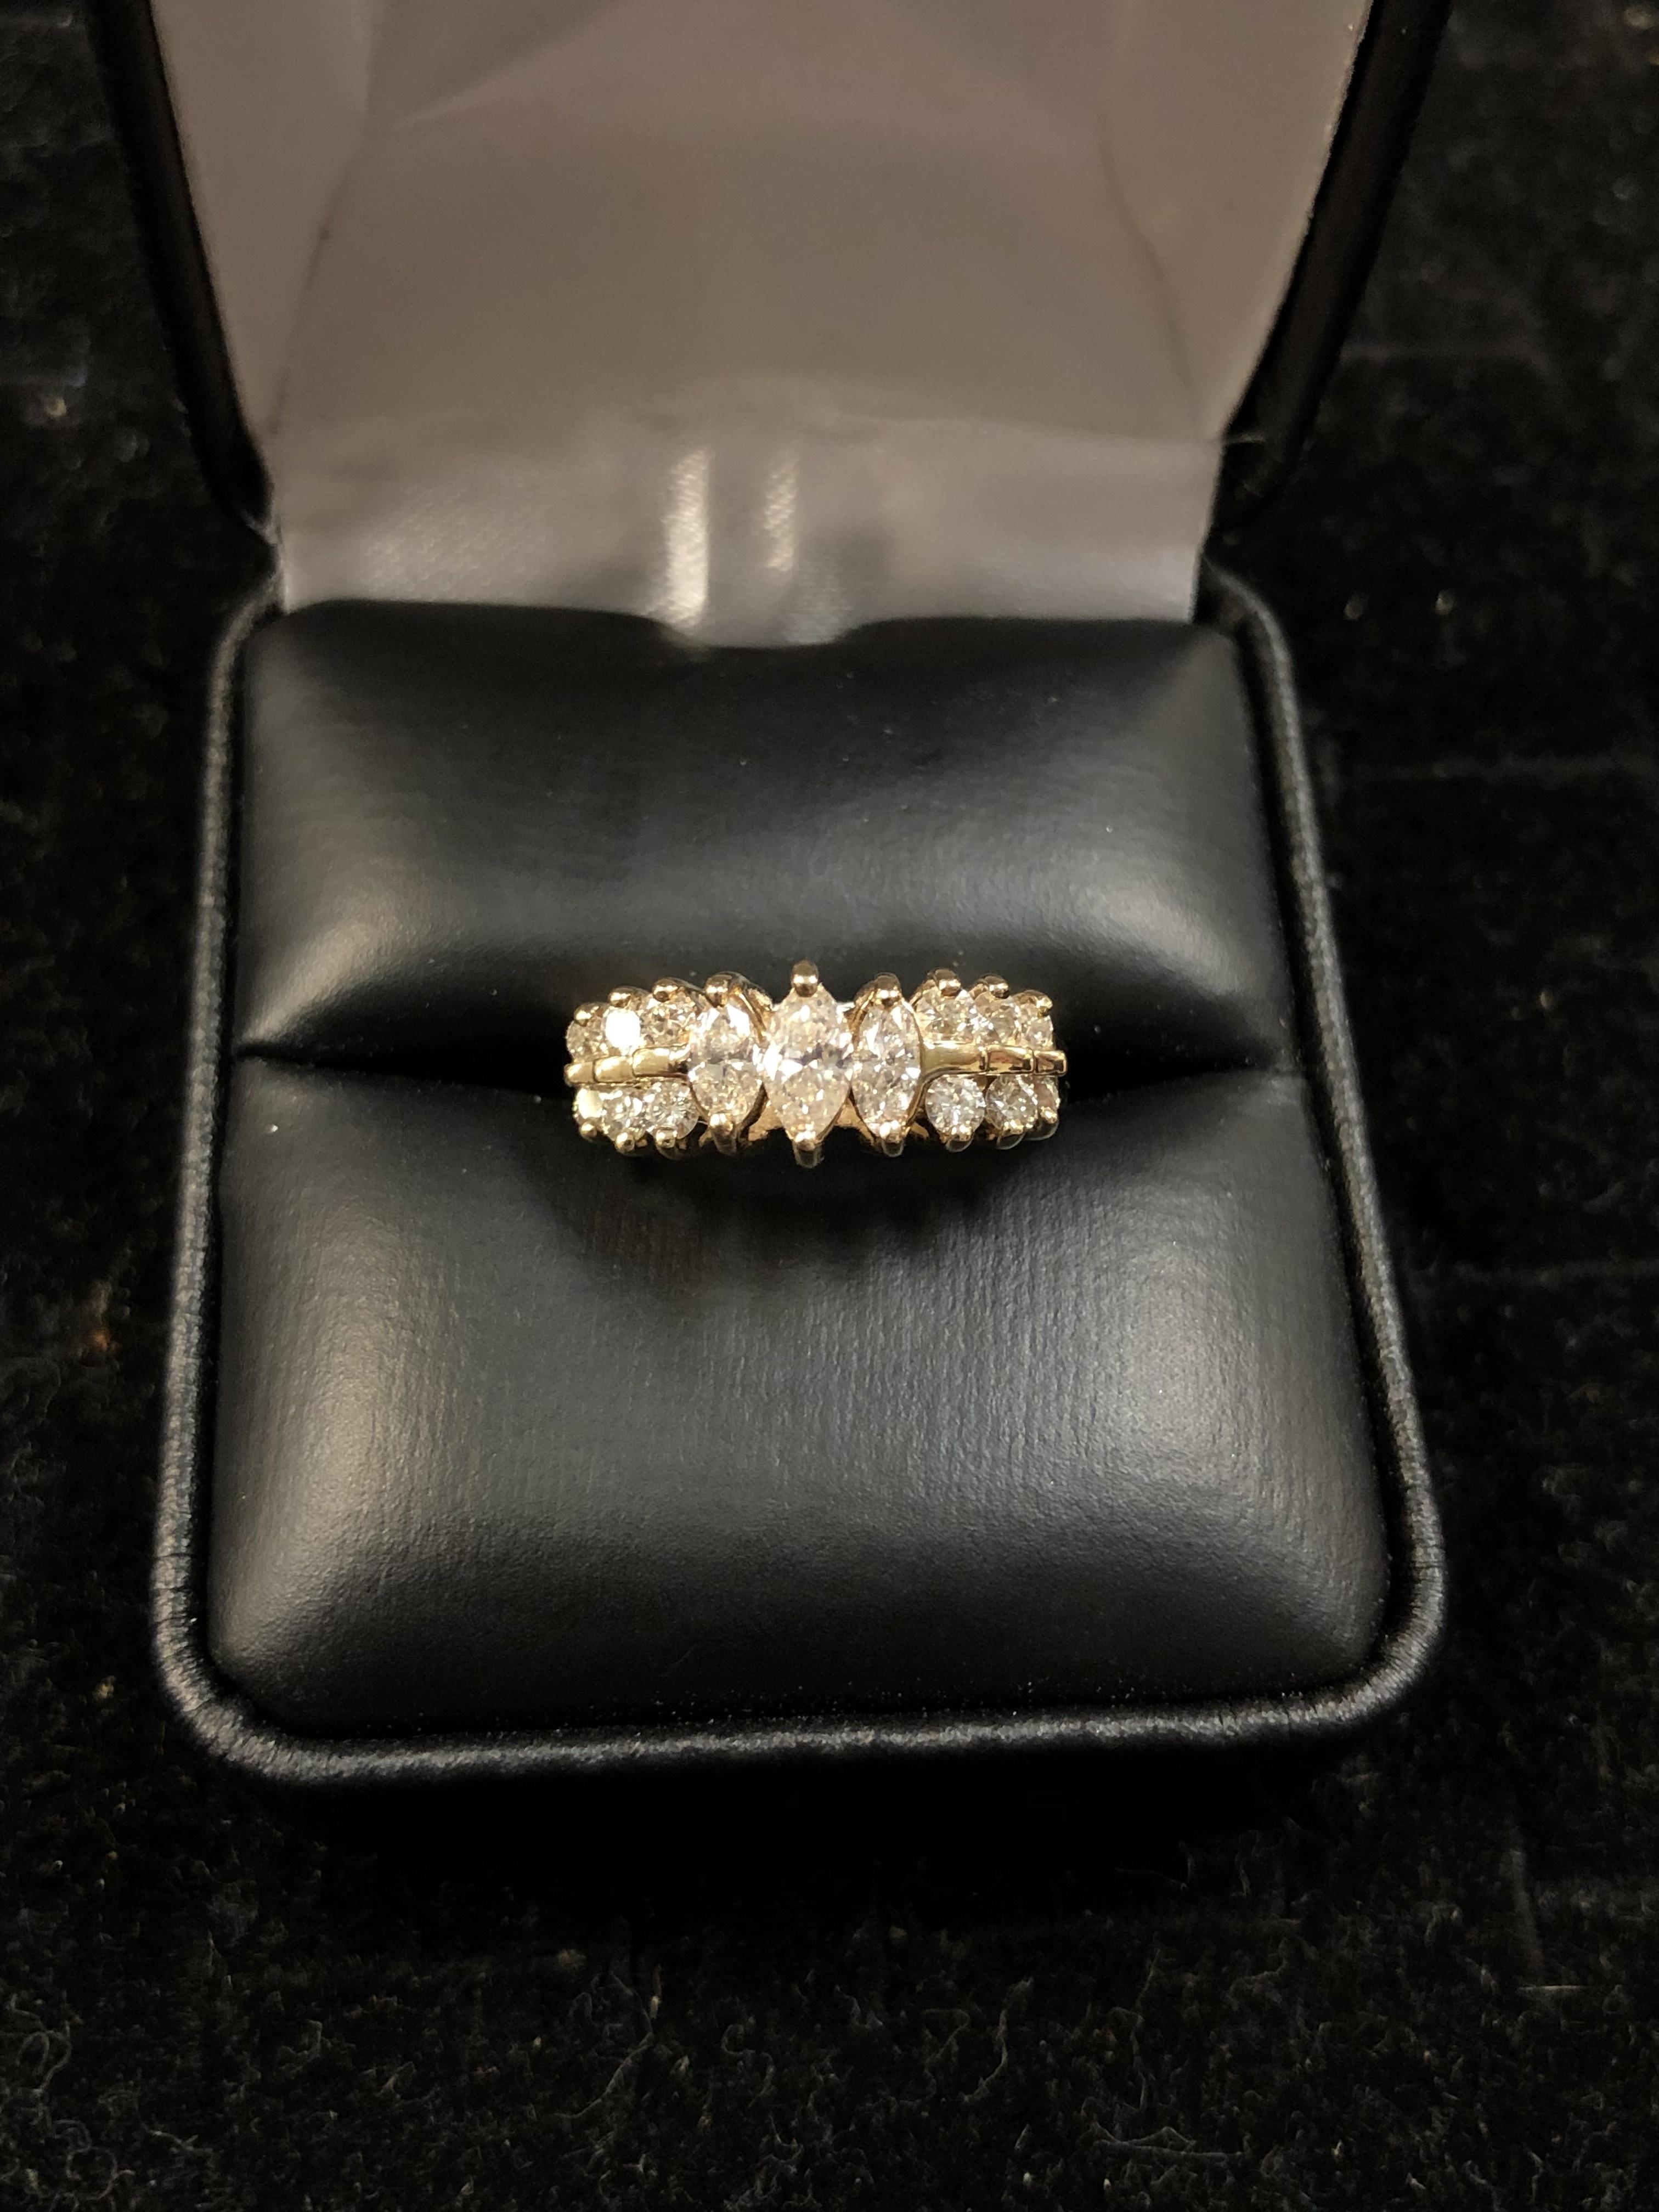 14 KT YELLOW GOLD 1/4 CT MARQUISE DIAMOND IN CENTER W/ SURROUNDING DIAMONDS